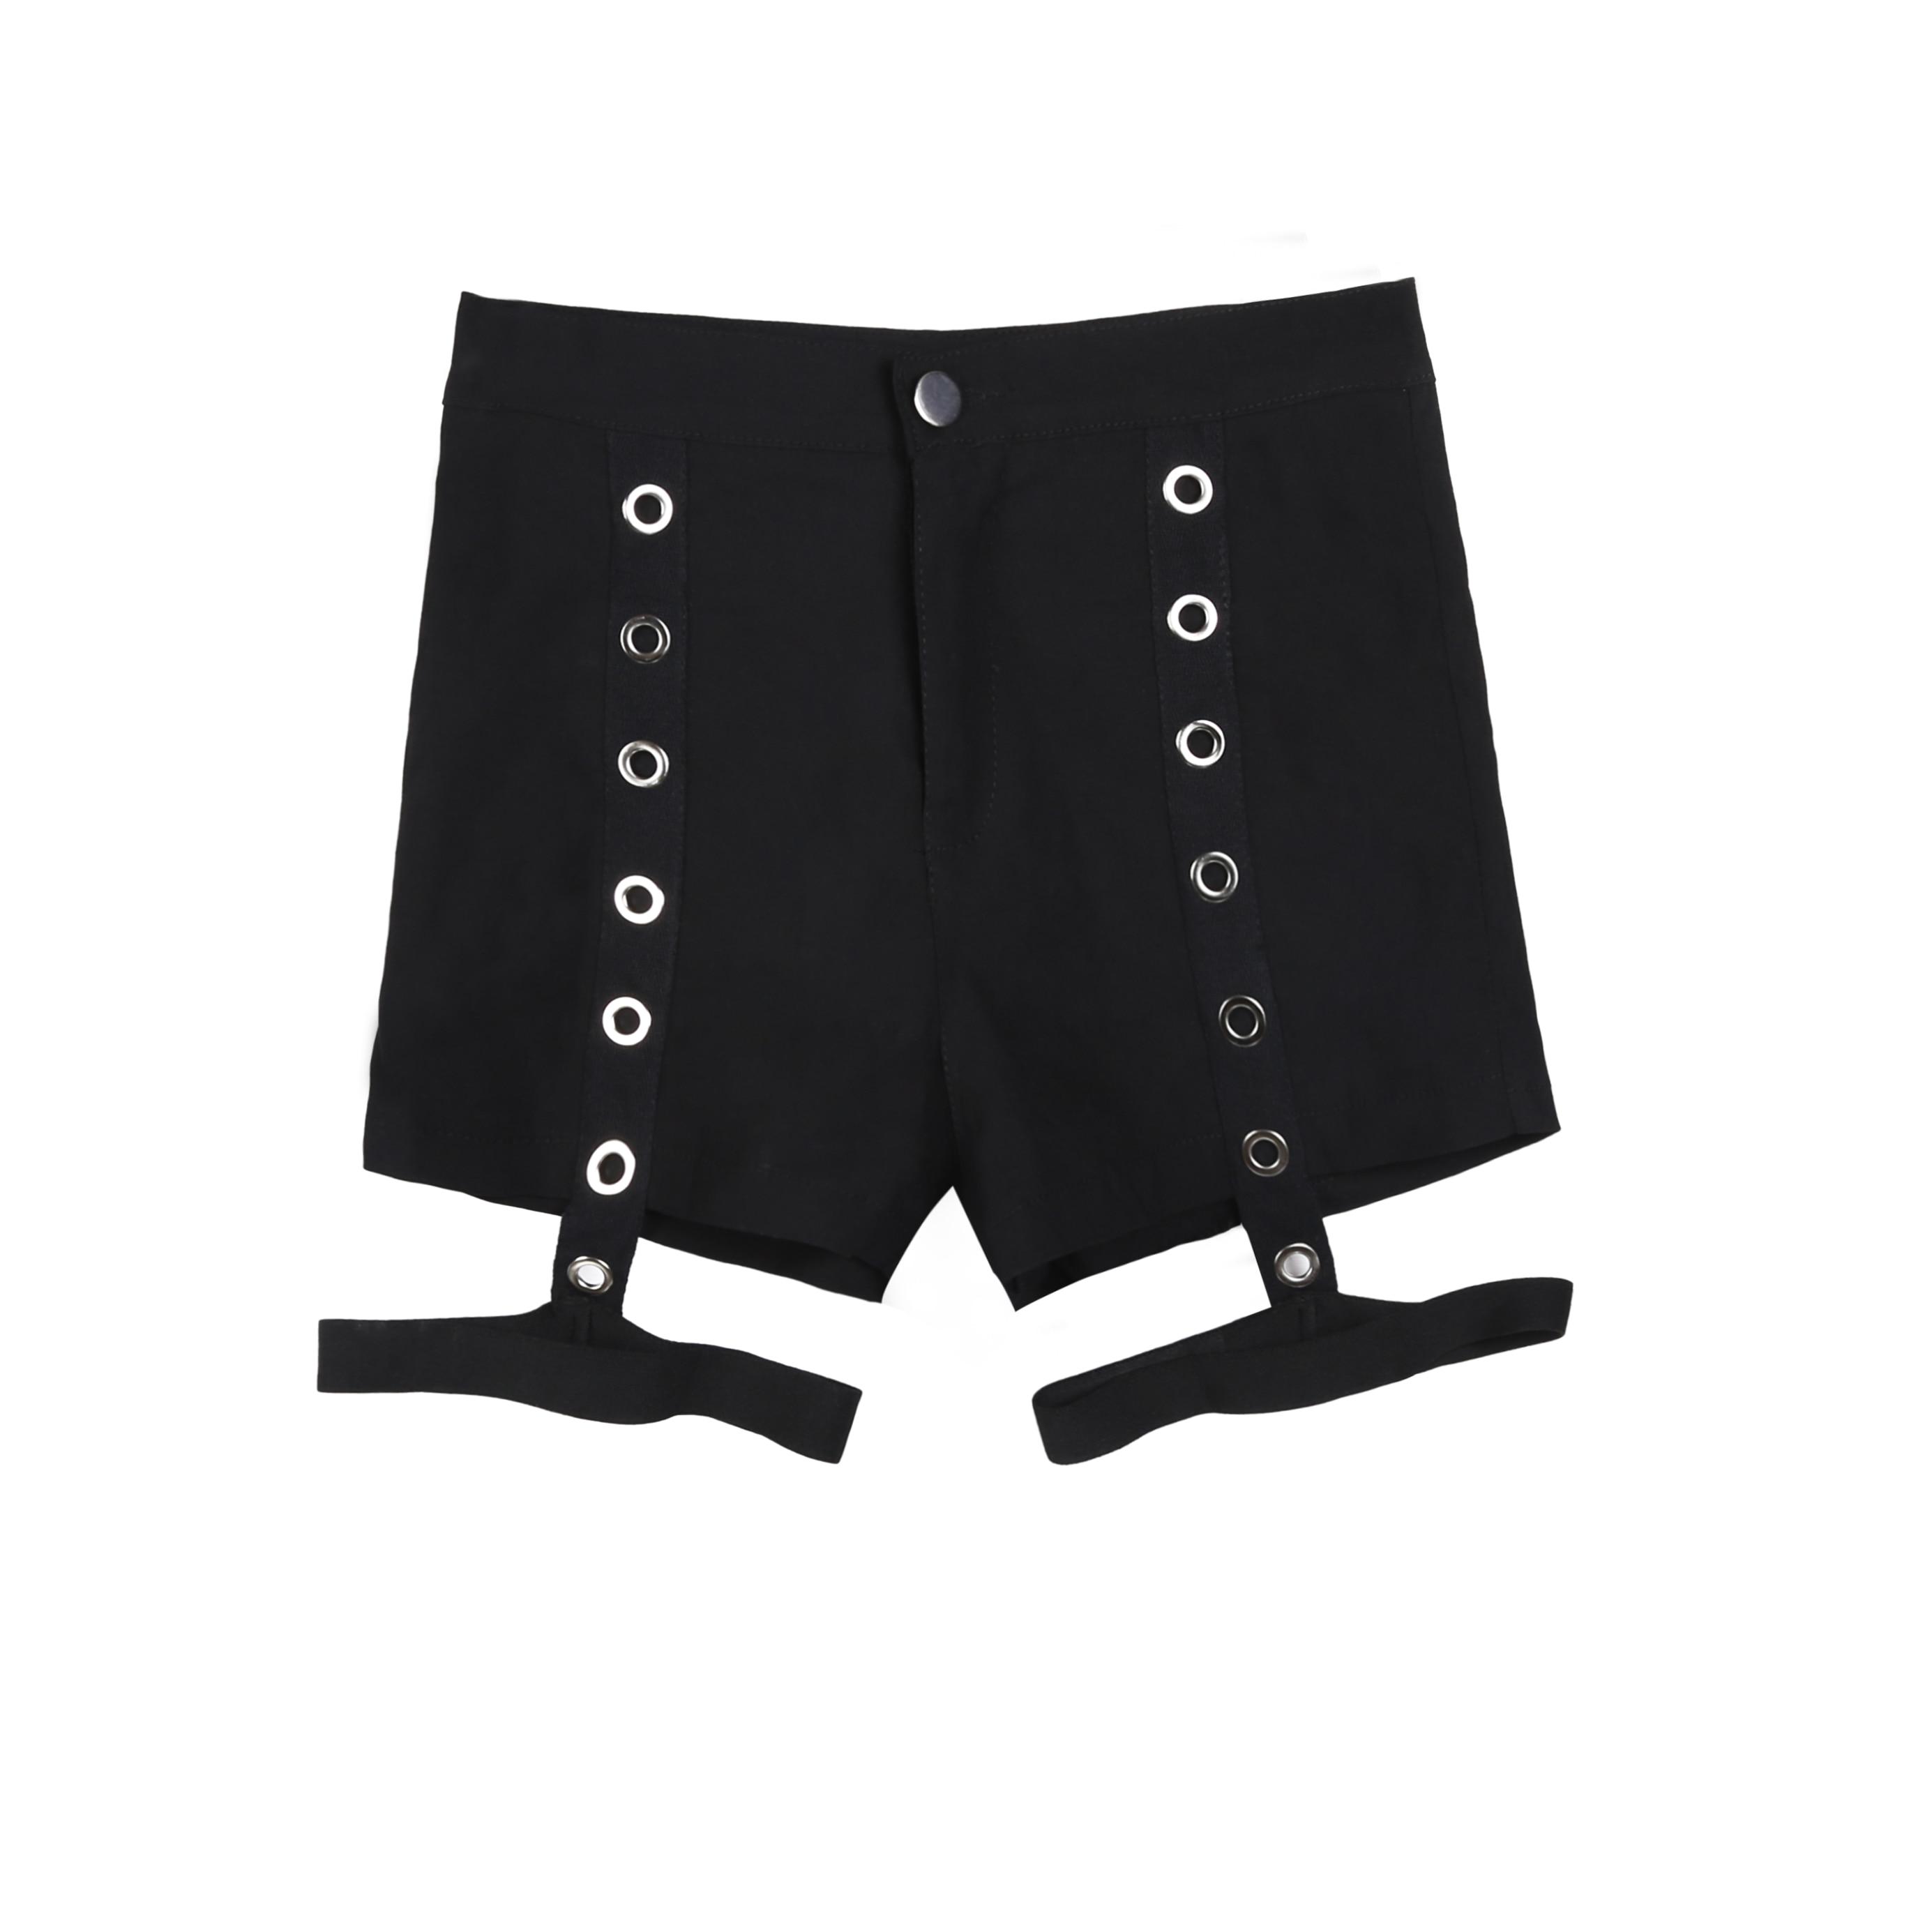 AIYANGA Punk Women Shorts 2020 Girls Harajuku Ring Cross High Waist Fashion Short Pants Summer Female Skinny Sexy Shorts